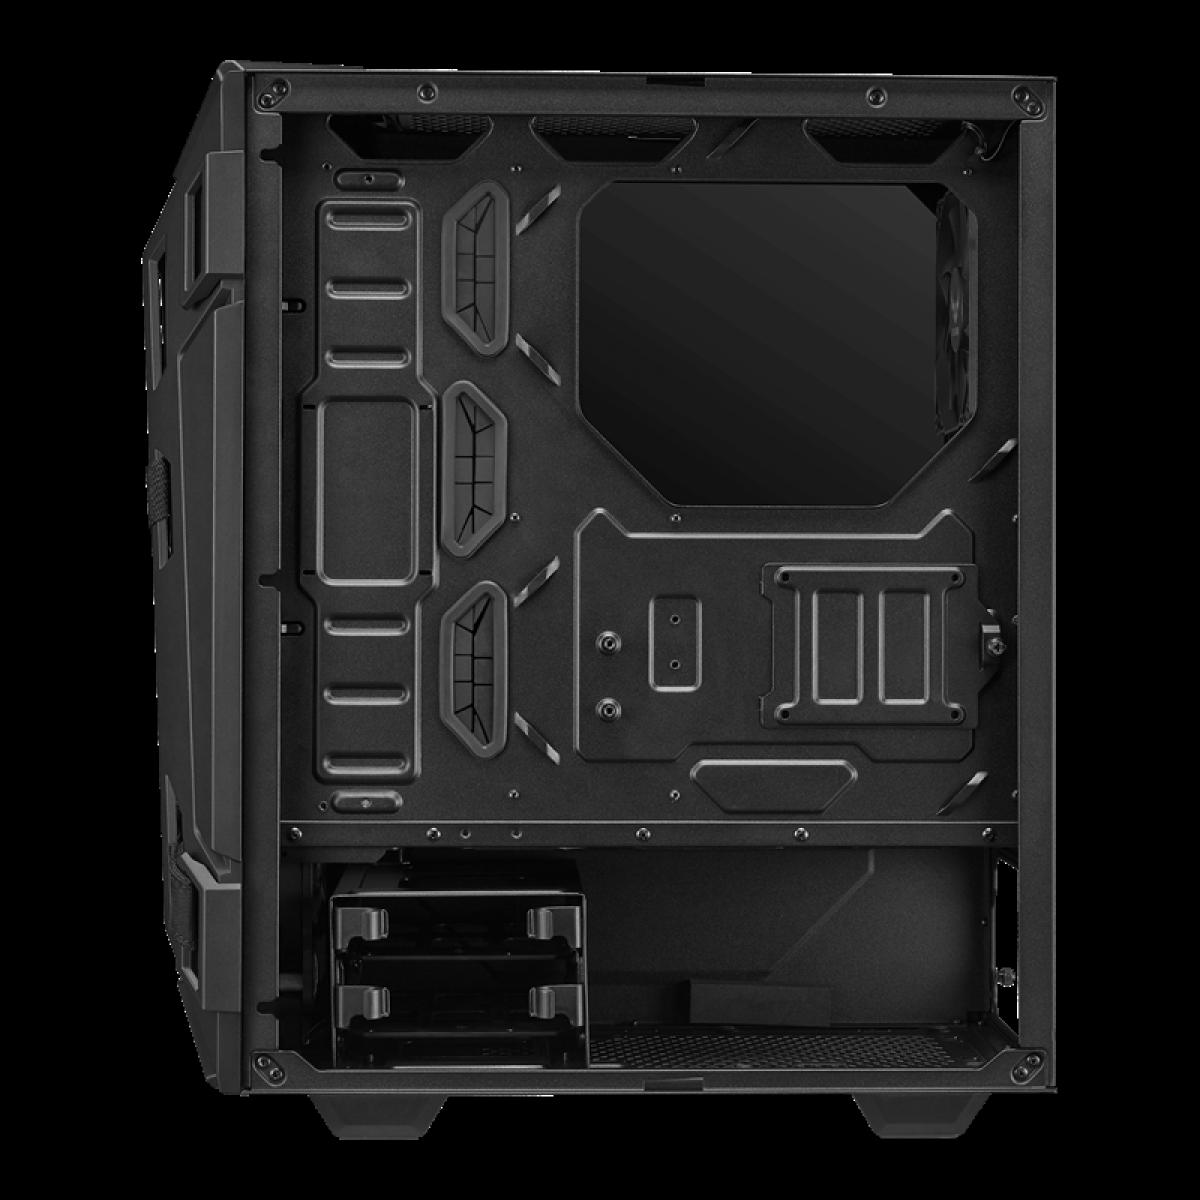 Gabinete Gamer ASUS TUF Gaming GT301, Mid-Tower, Vidro Temperado, Black, ATX, Sem Fonte, Com 4 Fans, 90DC0040-B40000